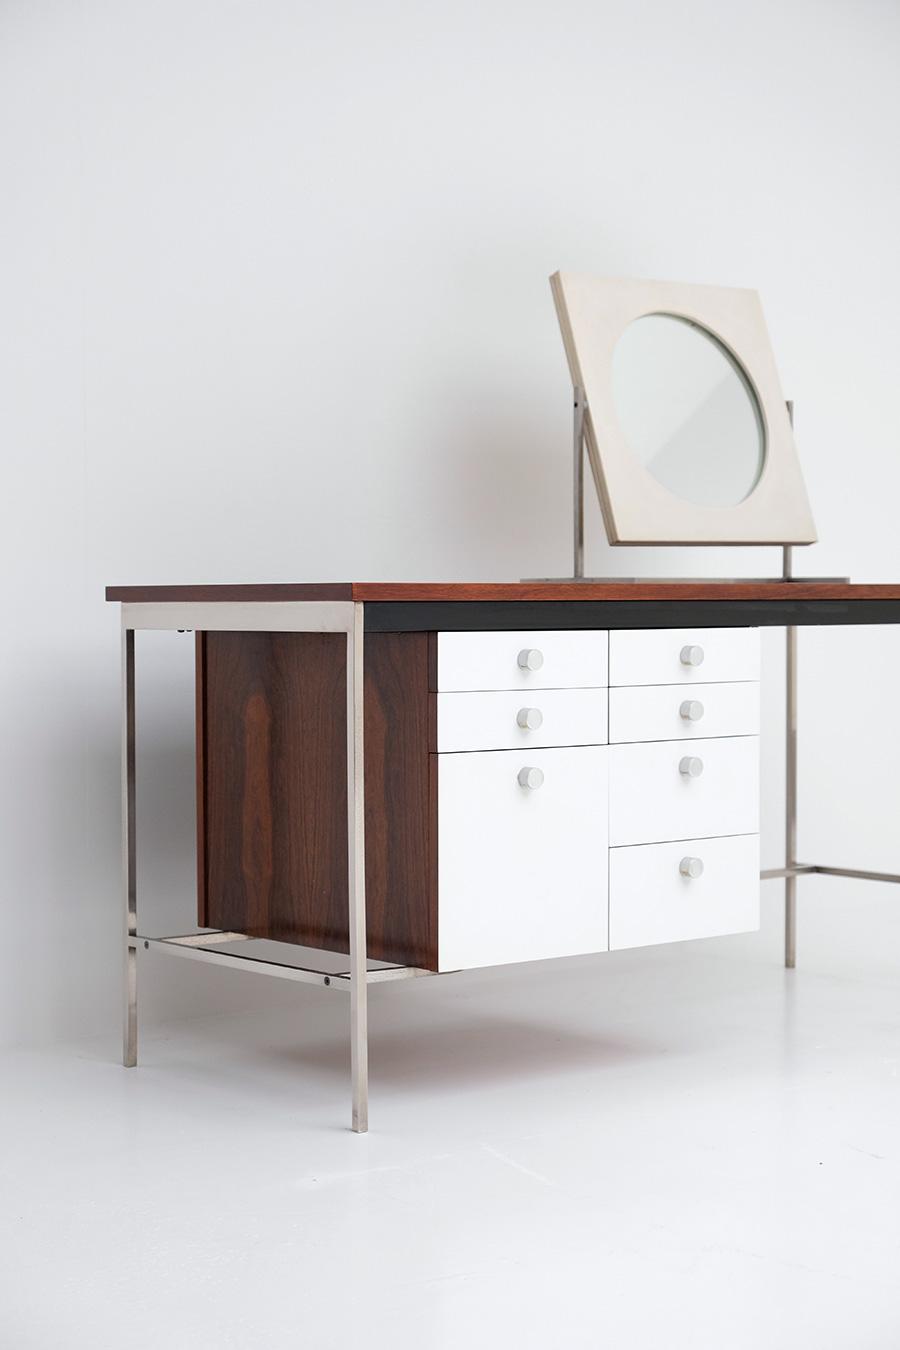 alfred-hendrickx-vanity-dressin-table-city_furmiture.jpg